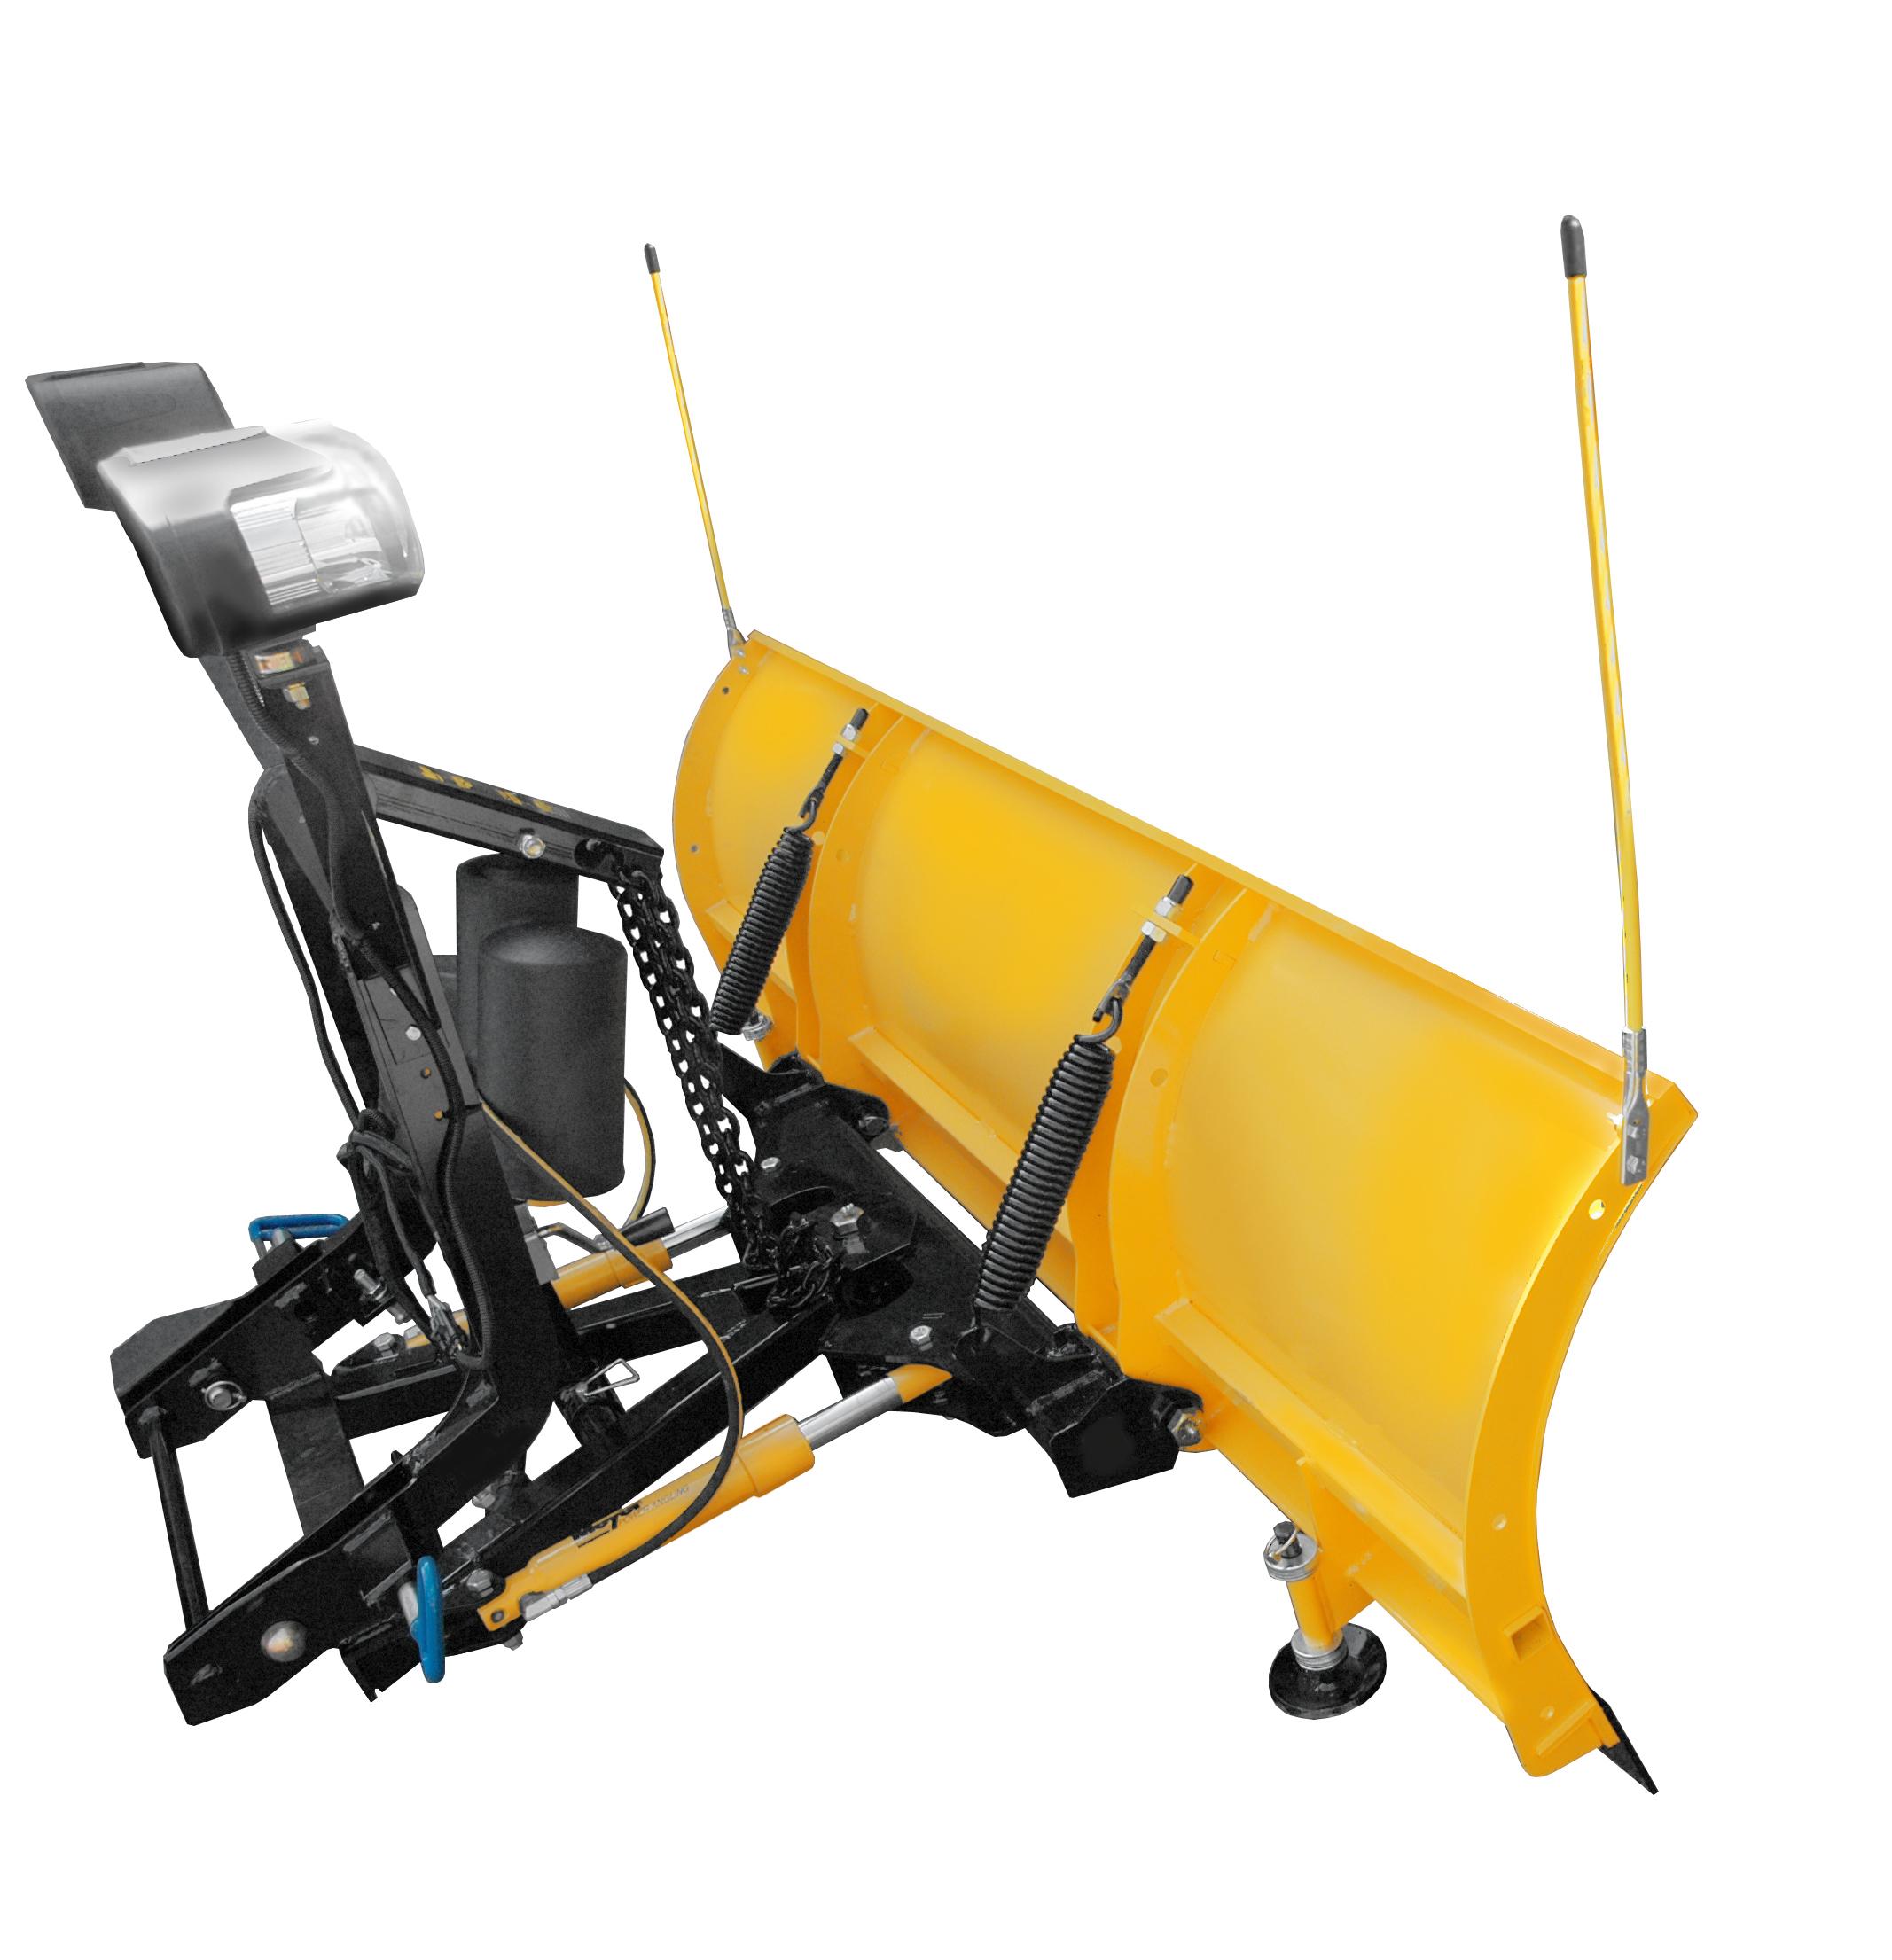 meyer plow pump r33 gtst stereo wiring diagram 6 drive pro hydraulic homeowner snow stuff